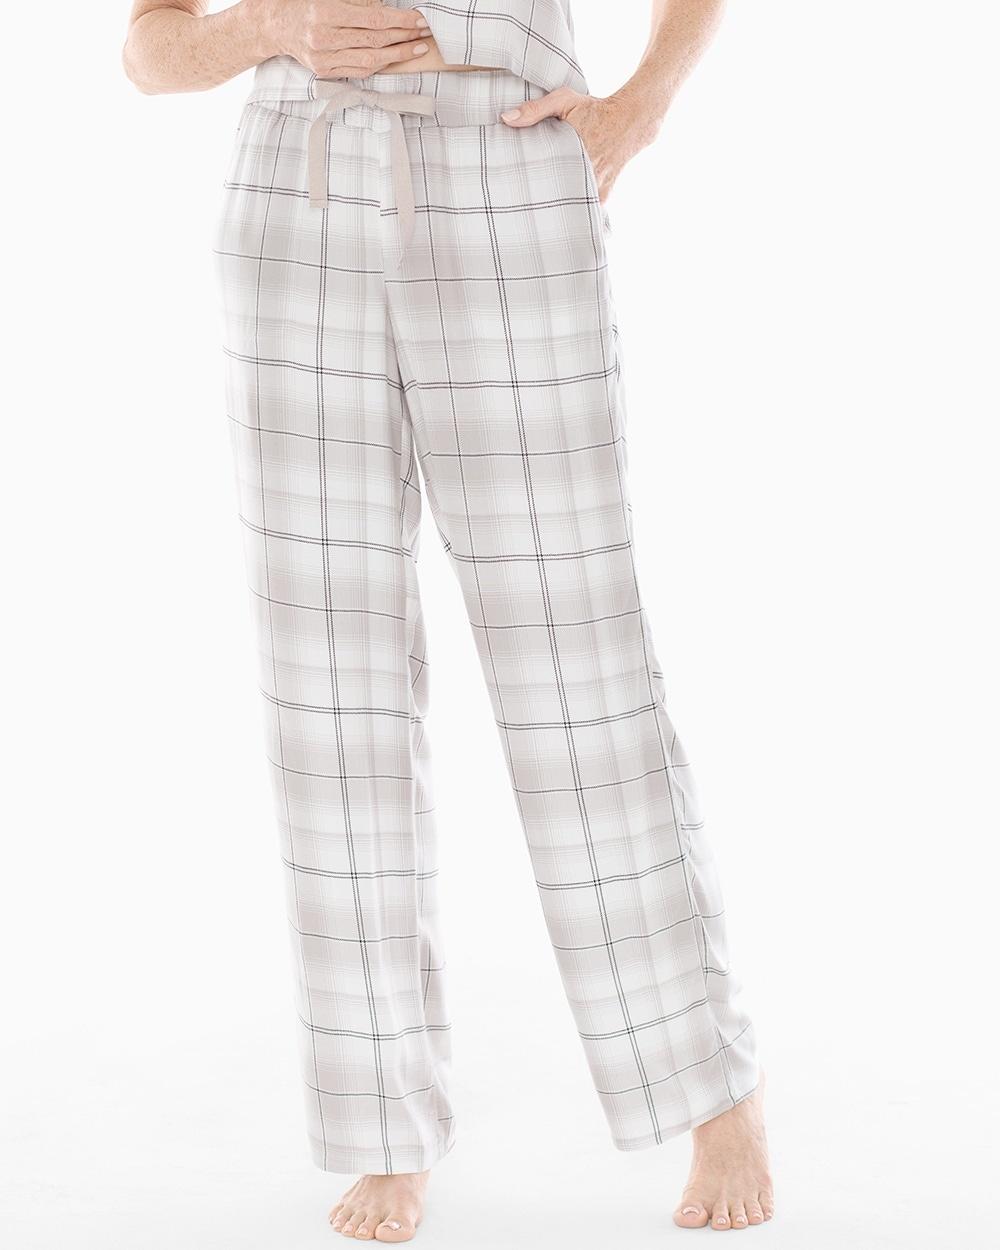 8b8bdfc672ce Pajama Pants Festive Plaid Opal - Soma